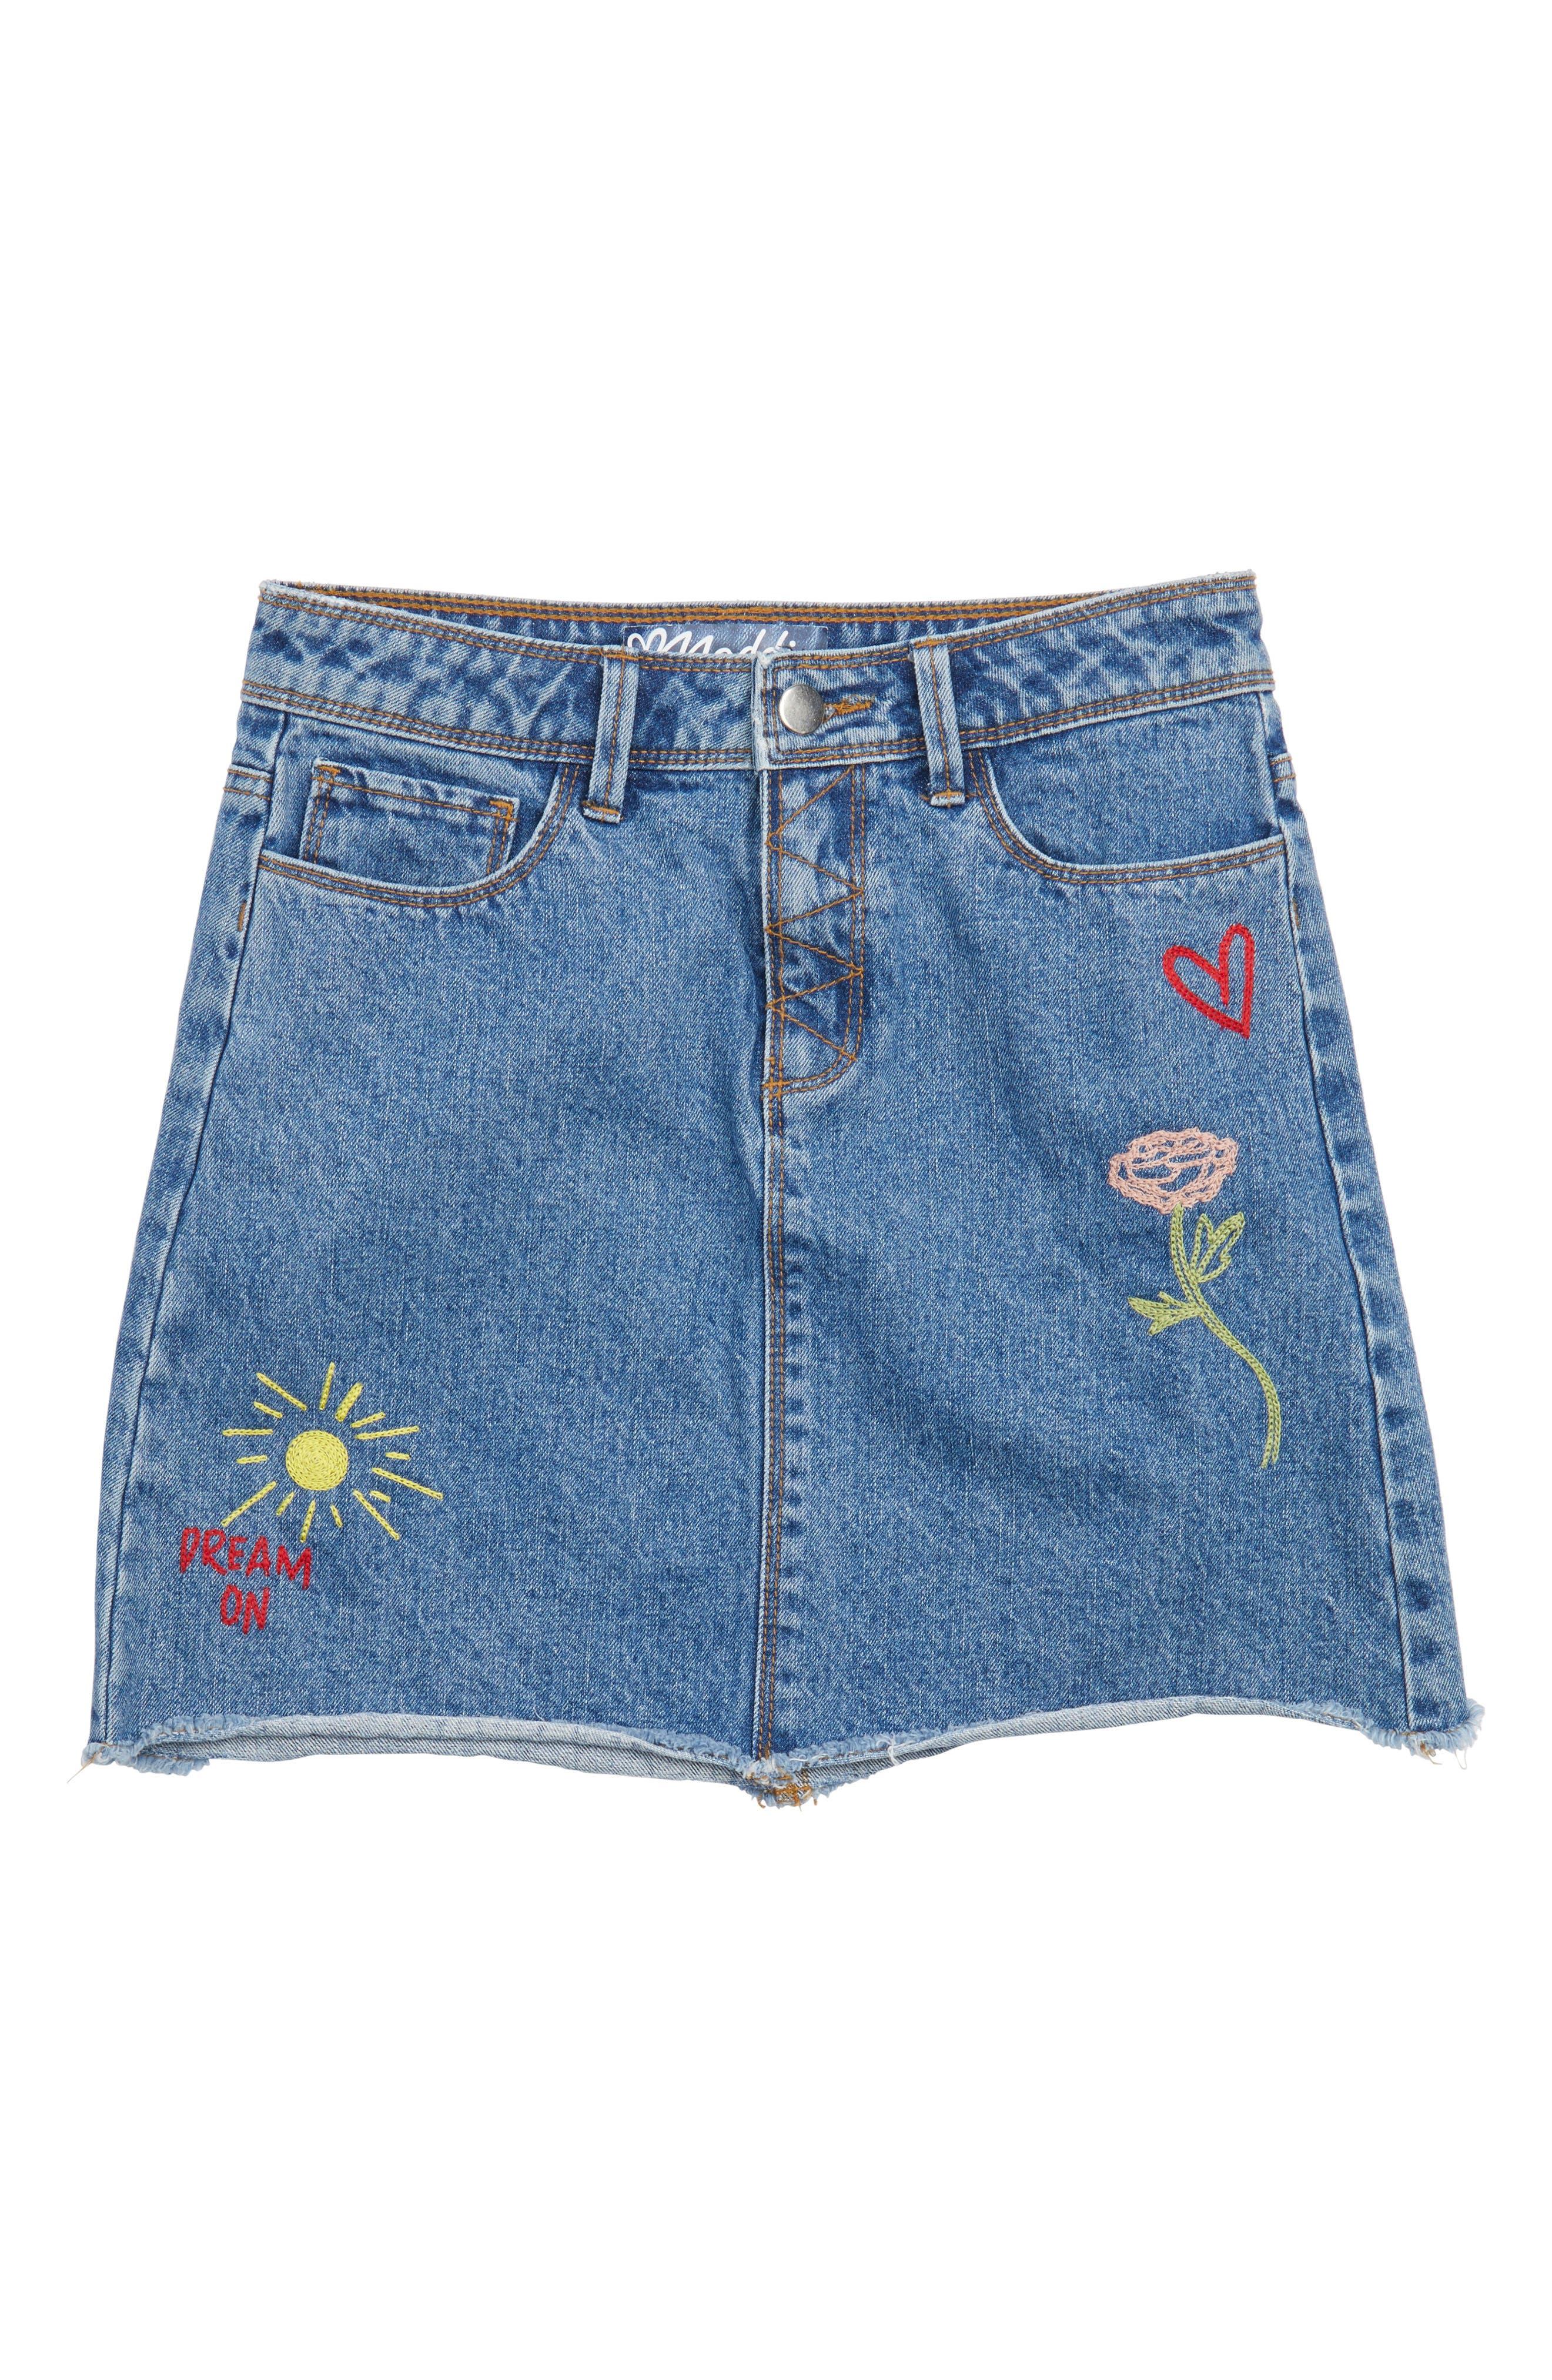 Embroidered Denim Skirt,                         Main,                         color, 487